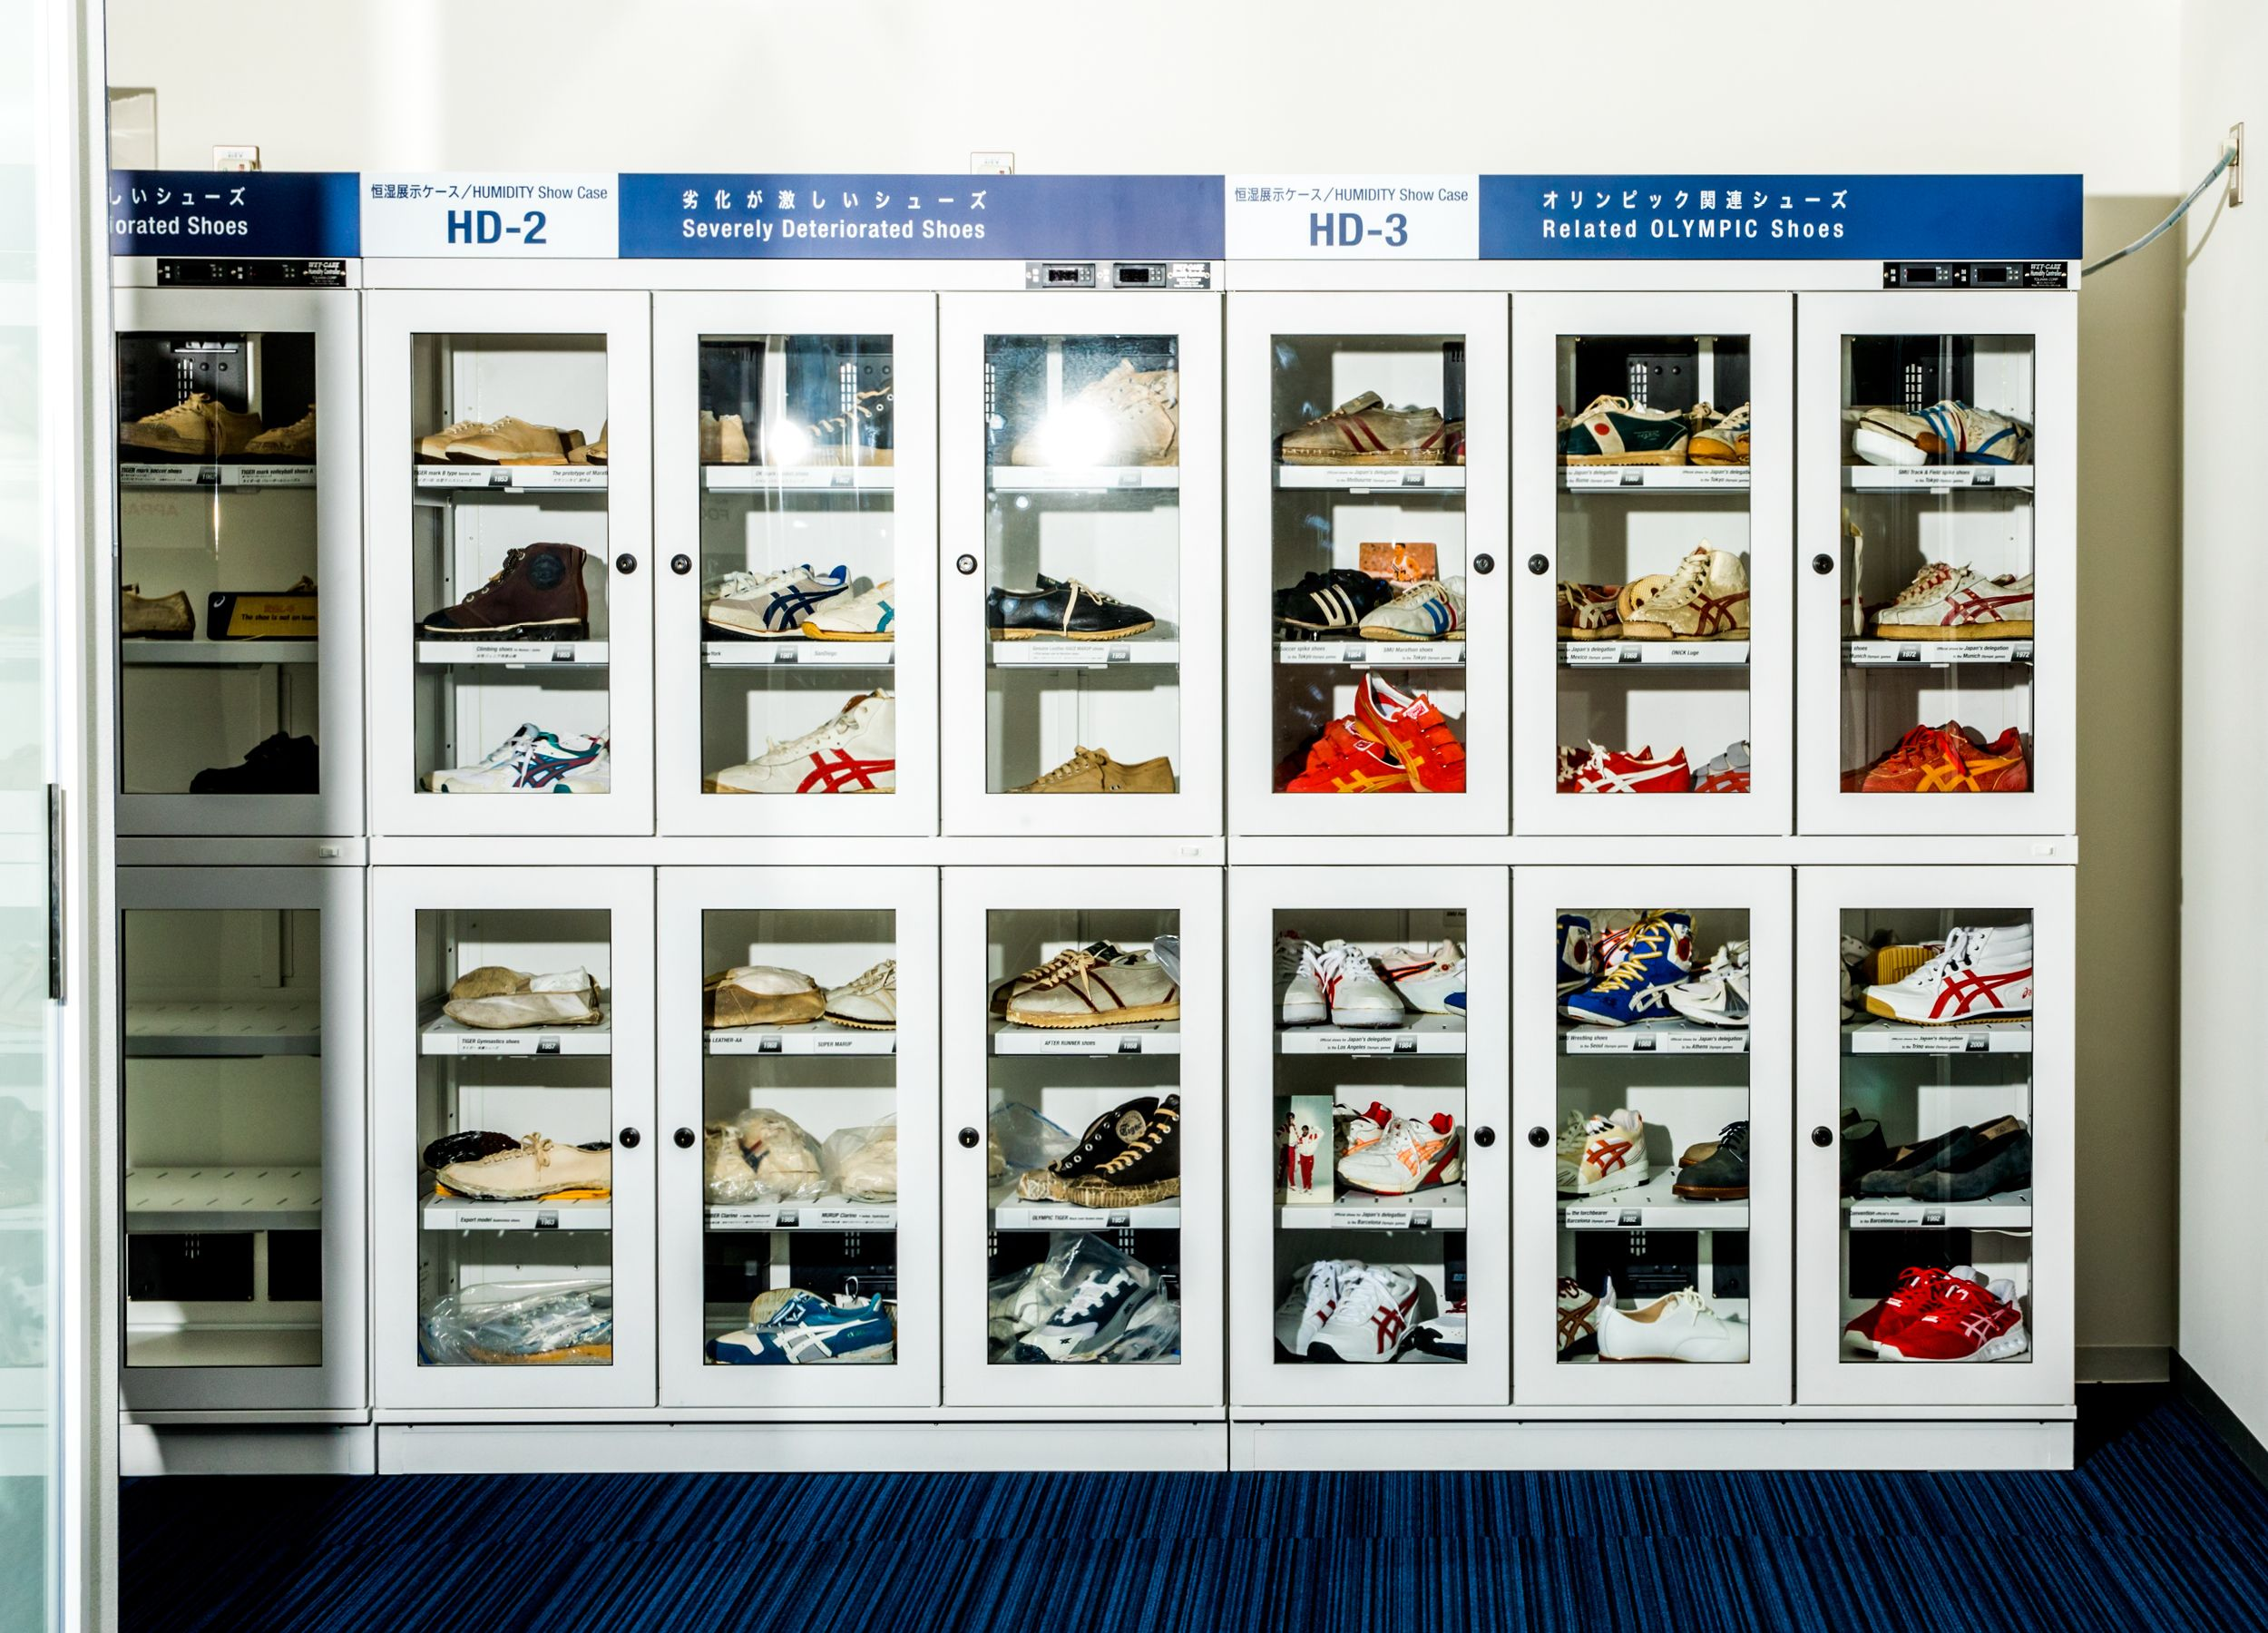 Asics Founder Kihachiro Onitsuka Is the Original Sneakerhead